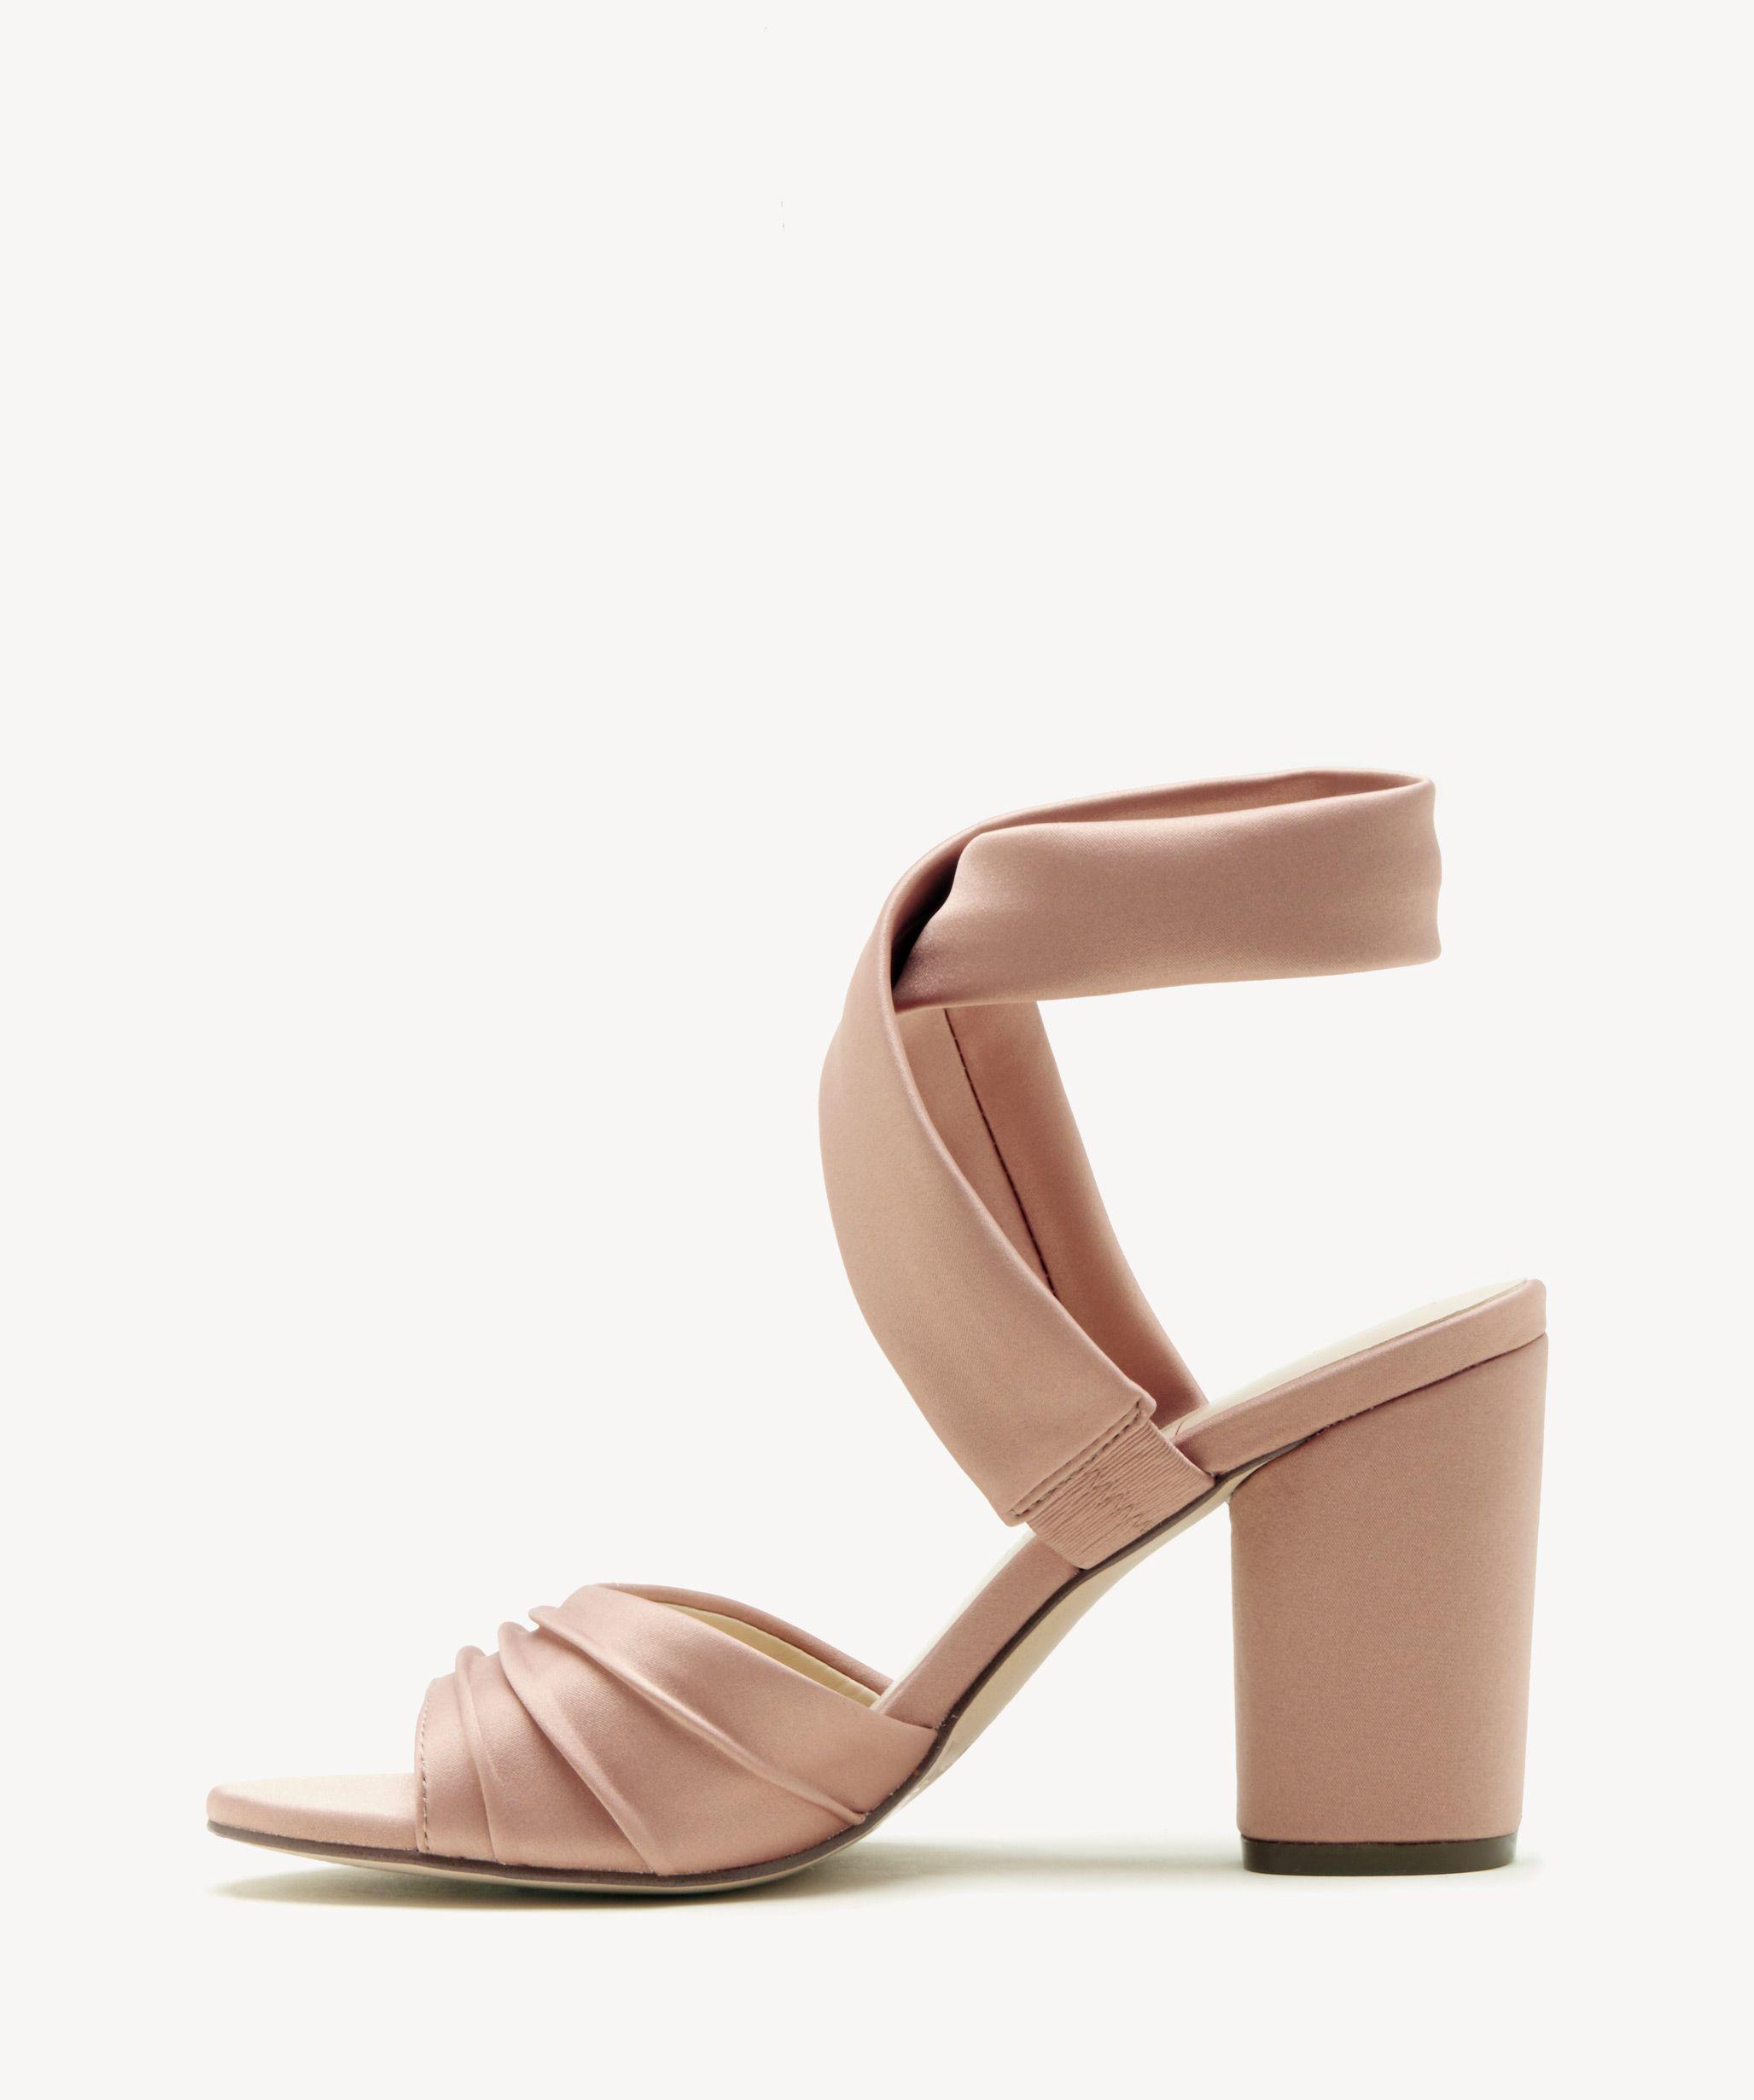 796f801f002d Lyst - Sole Society Selbie Satin Block Heel Sandal